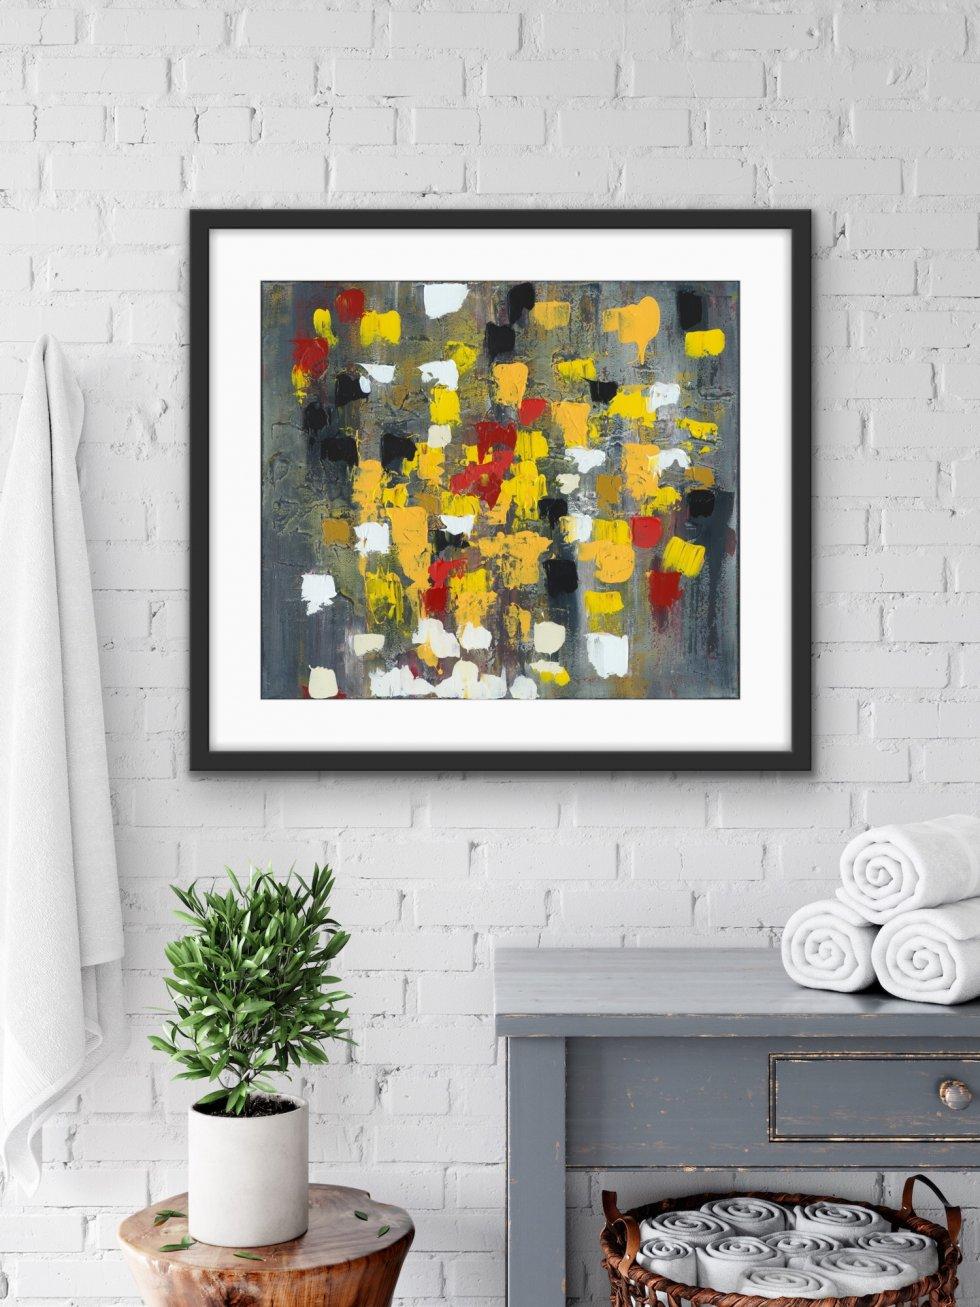 Colourful Rain - Print - Home Interior   AlessandraViola.co.uk